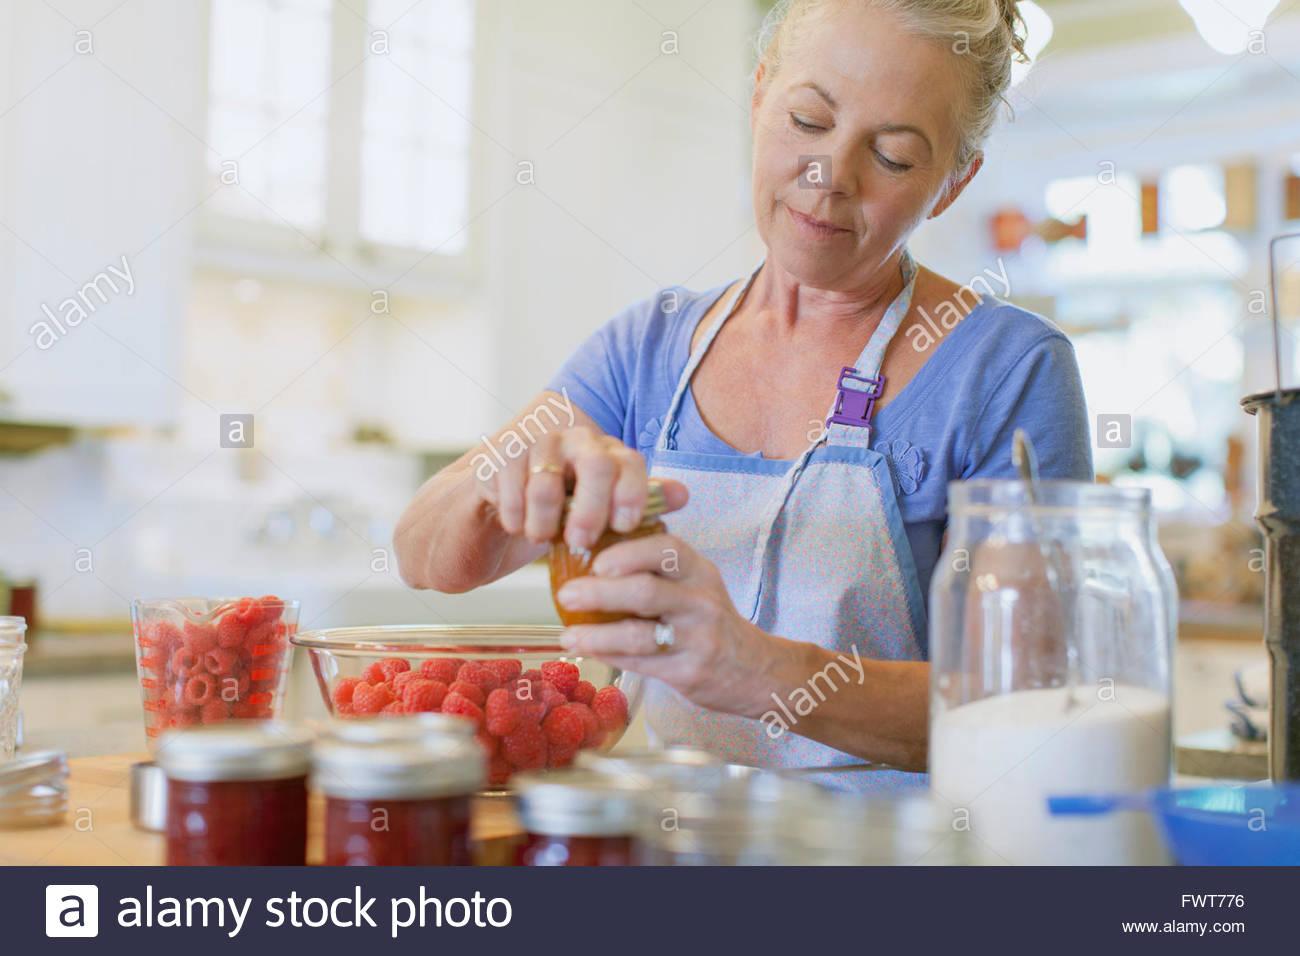 Woman making jam in kitchen. - Stock Image